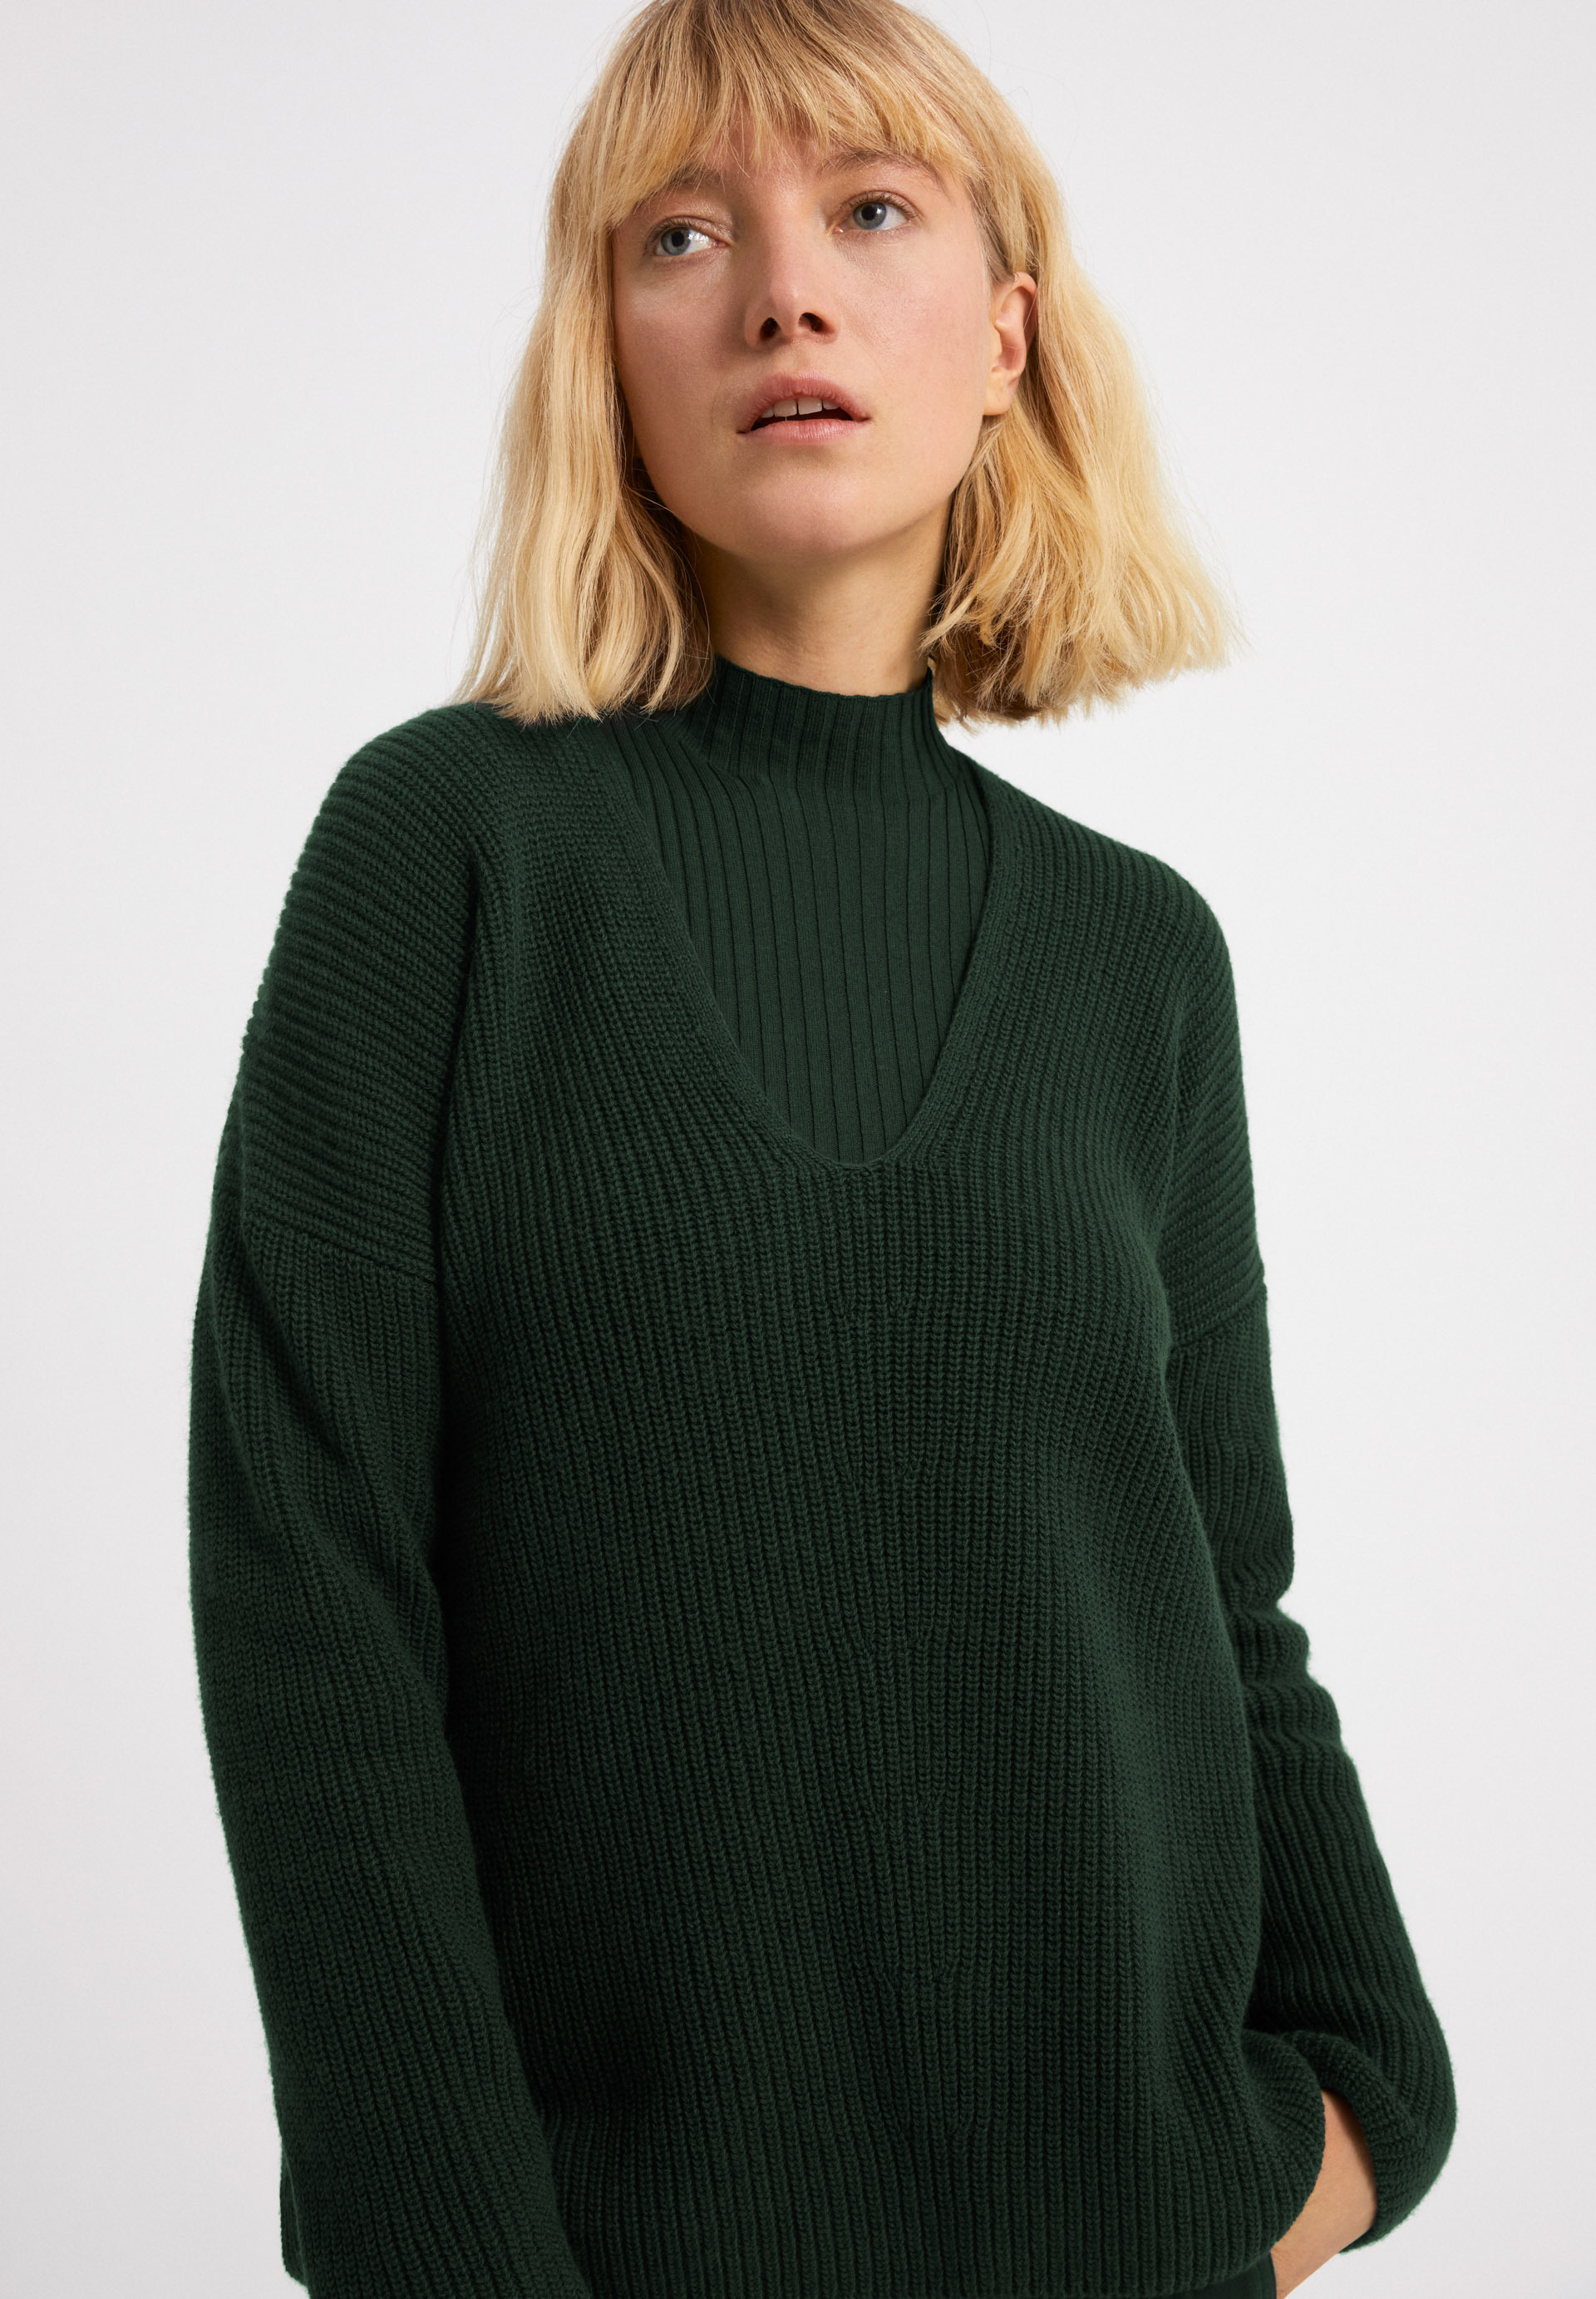 ARYANAA Sweater made of Organic Cotton Mix